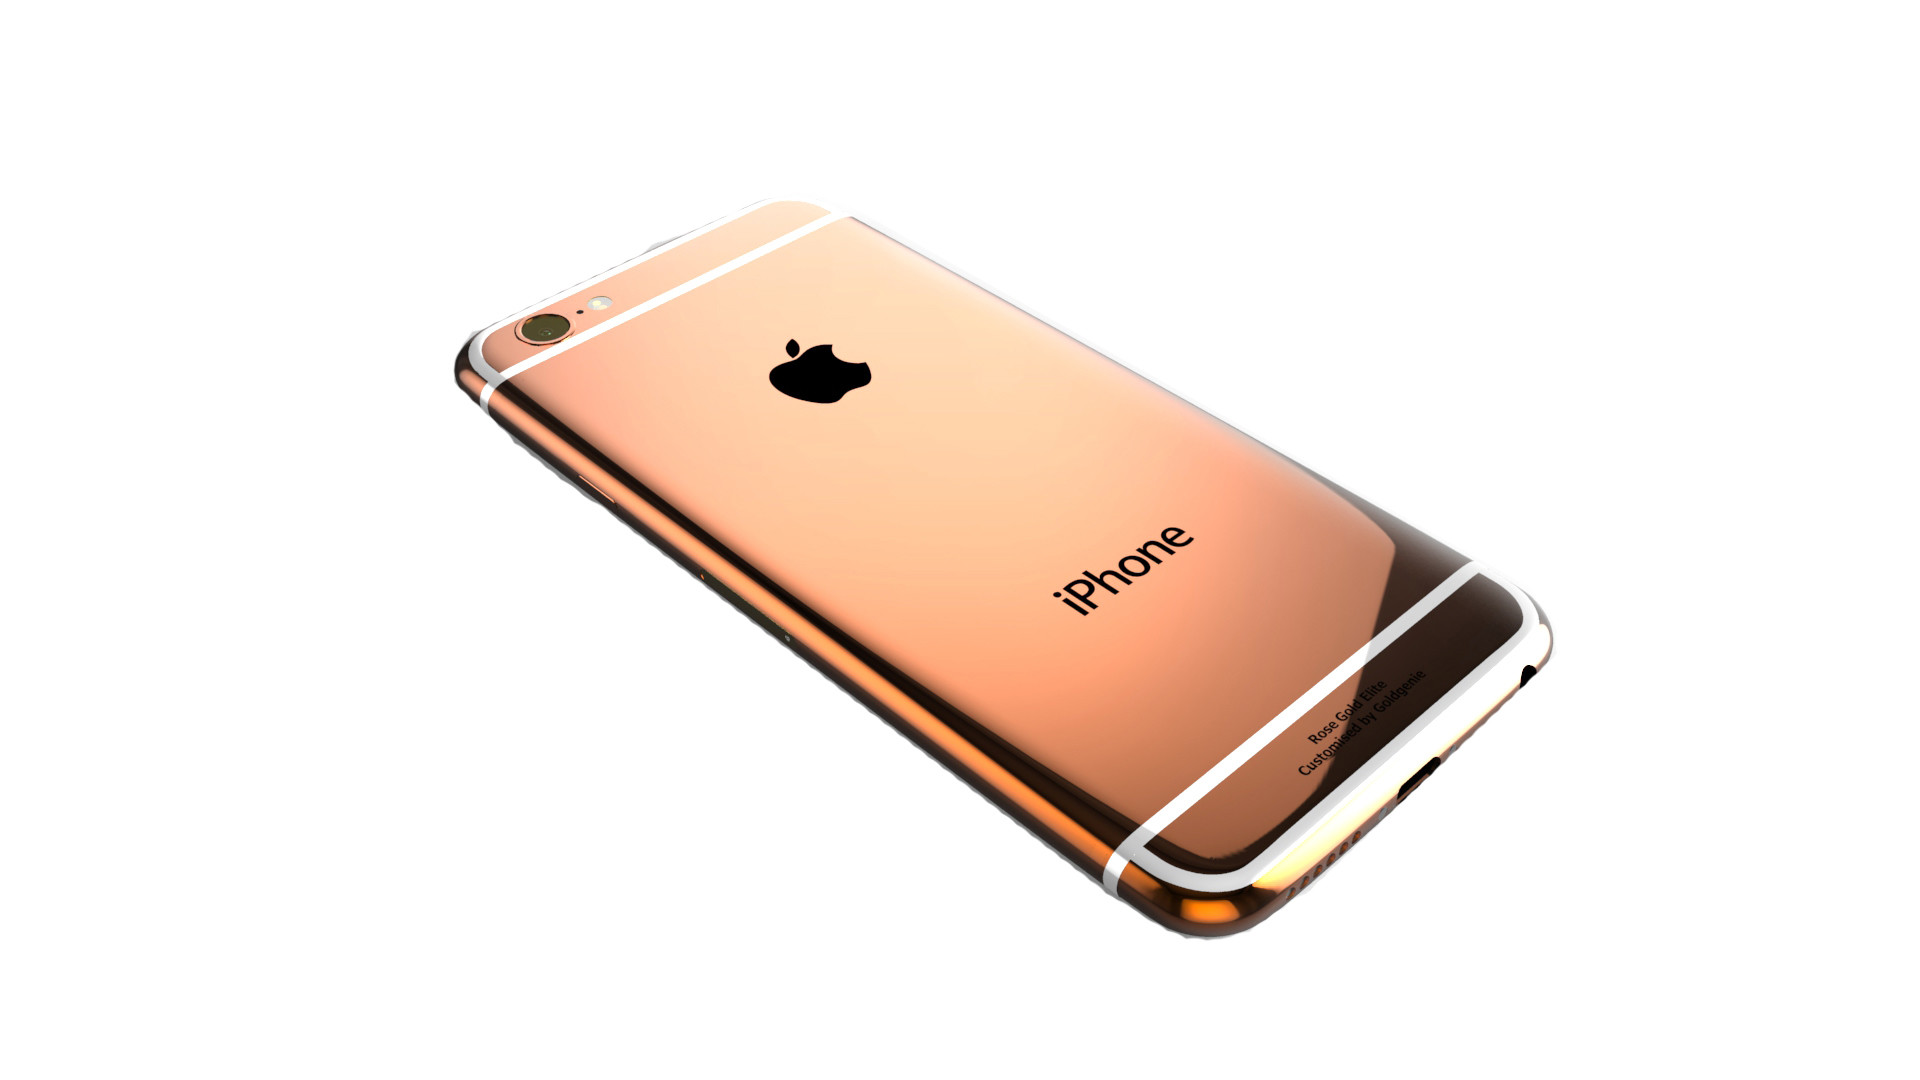 Iphone 6 Plus Gold Wallpaper HD Desktop